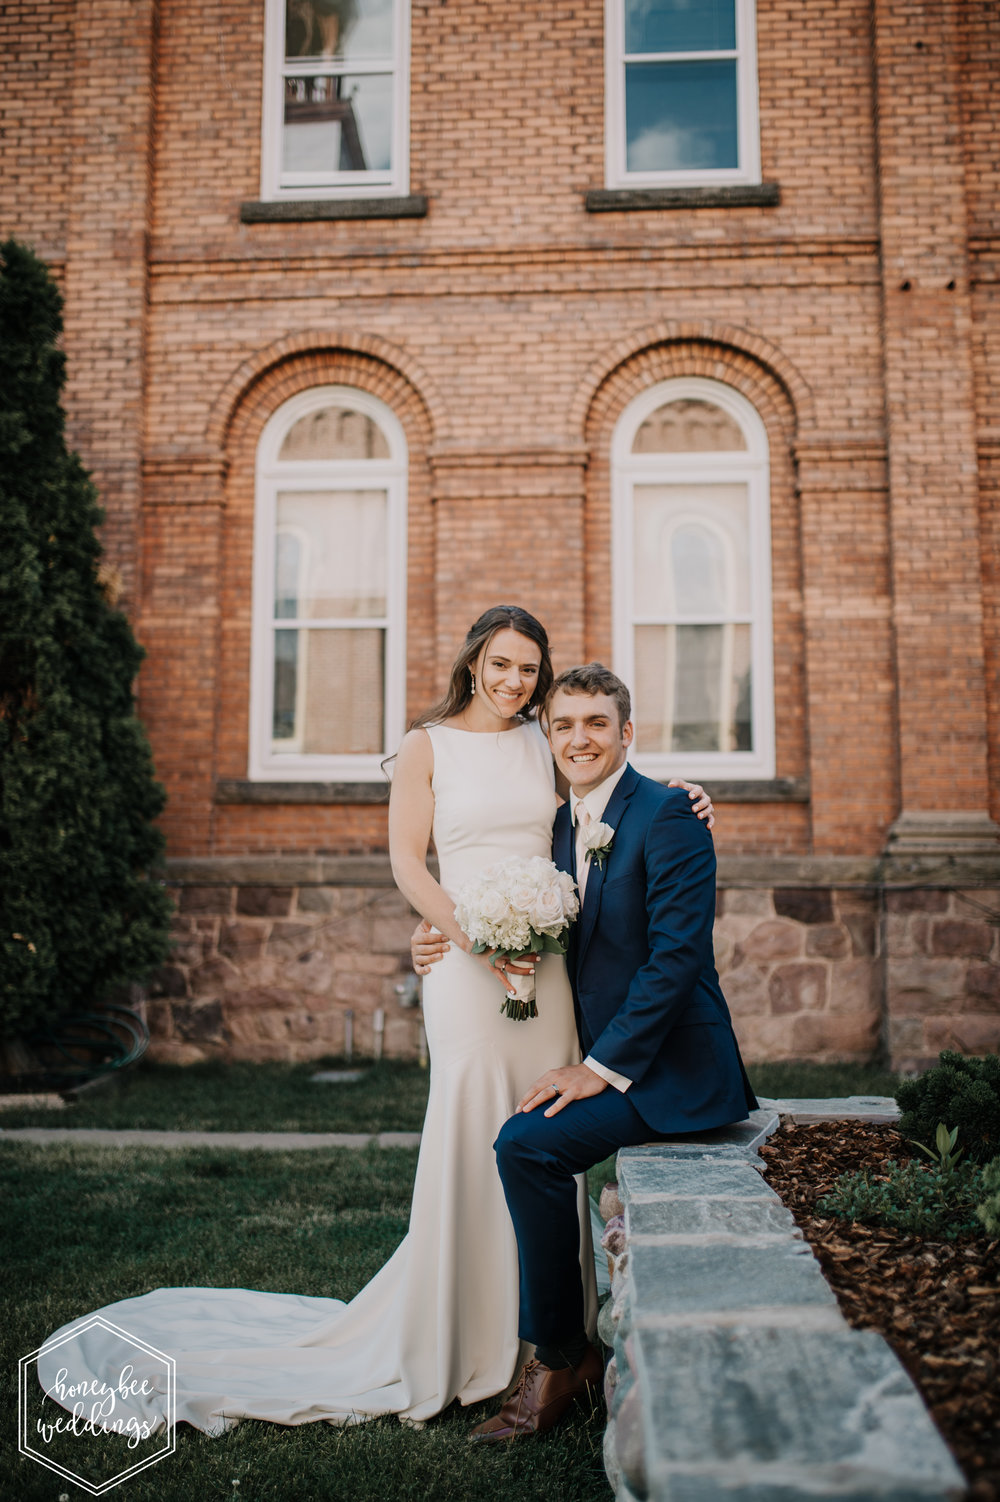 206 Montana Wedding Photographer_St. Francis Wedding_Tifani Zanto + Ryan Burke -6851.jpg